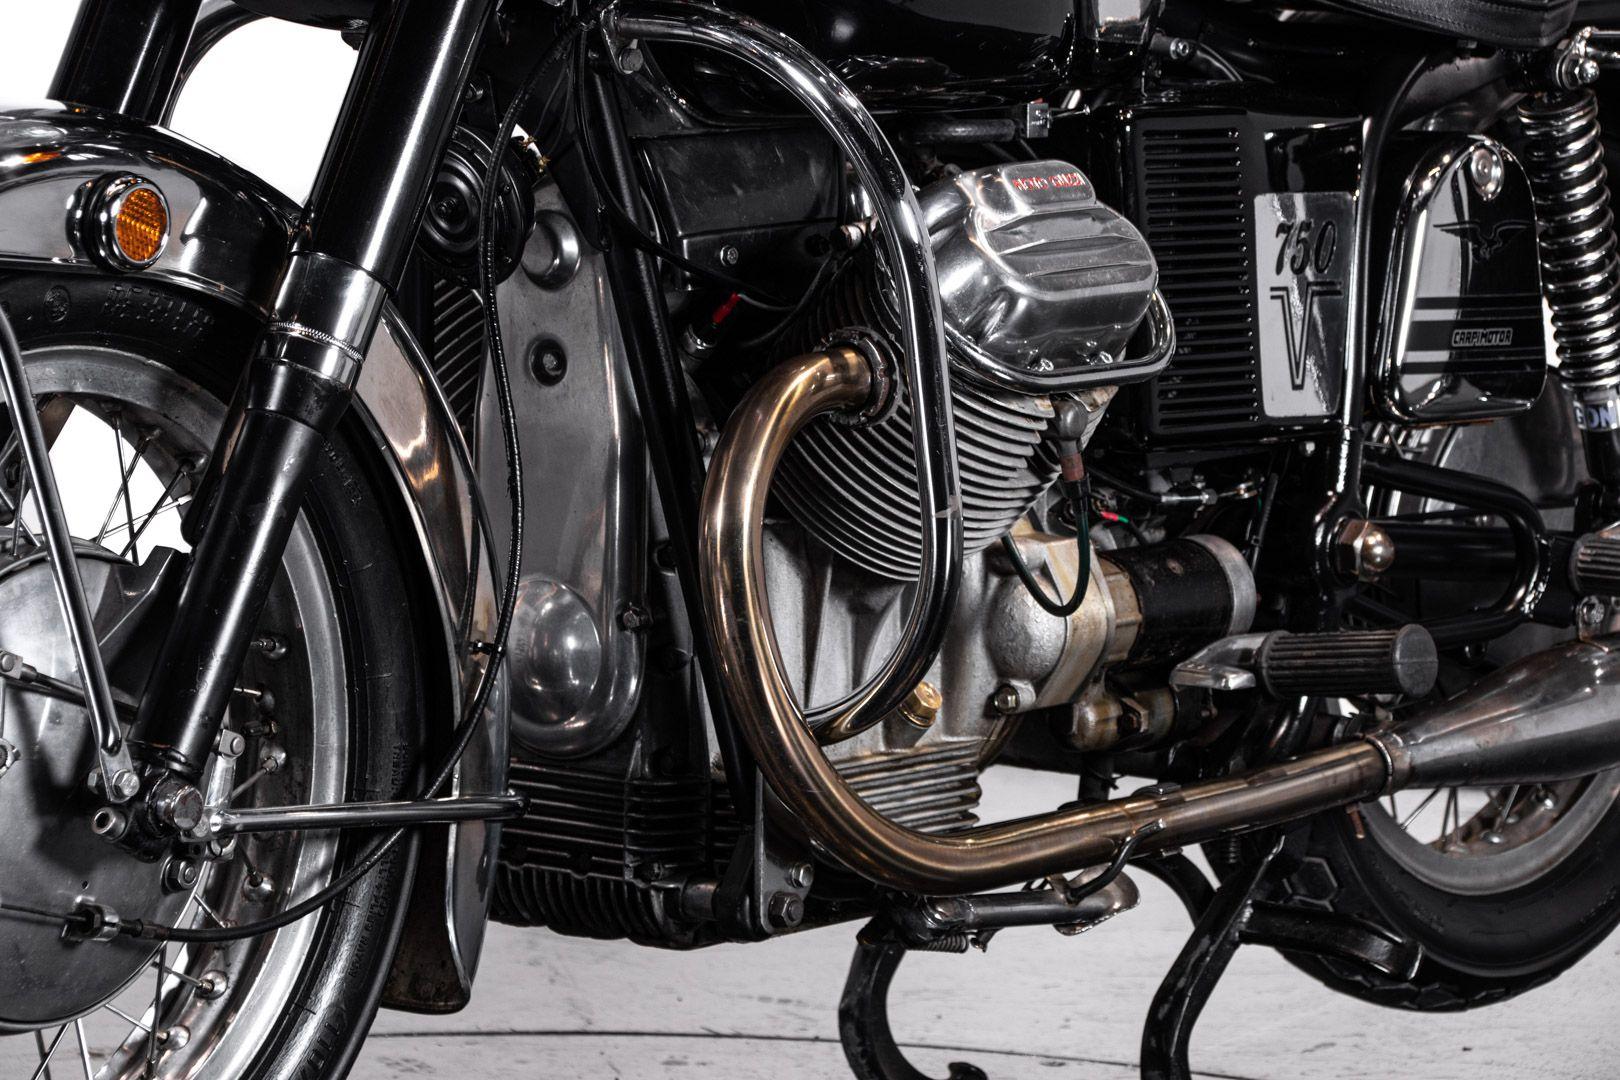 1969 Moto Guzzi V7 Special 81484